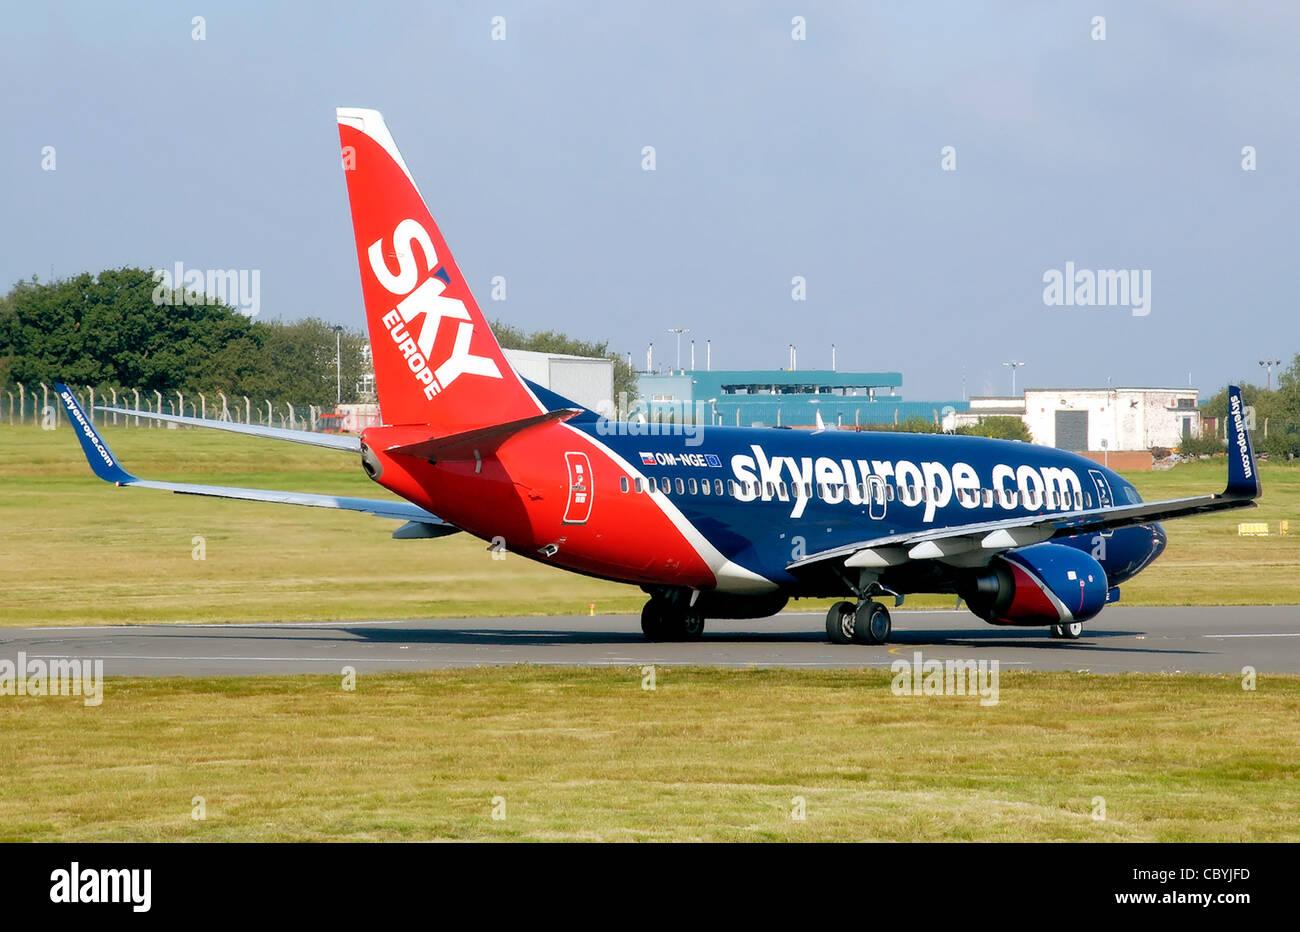 SkyEurope Boeing 737-700 (OM-NGE) starts its takeoff run at Birmingham International Airport, England. - Stock Image